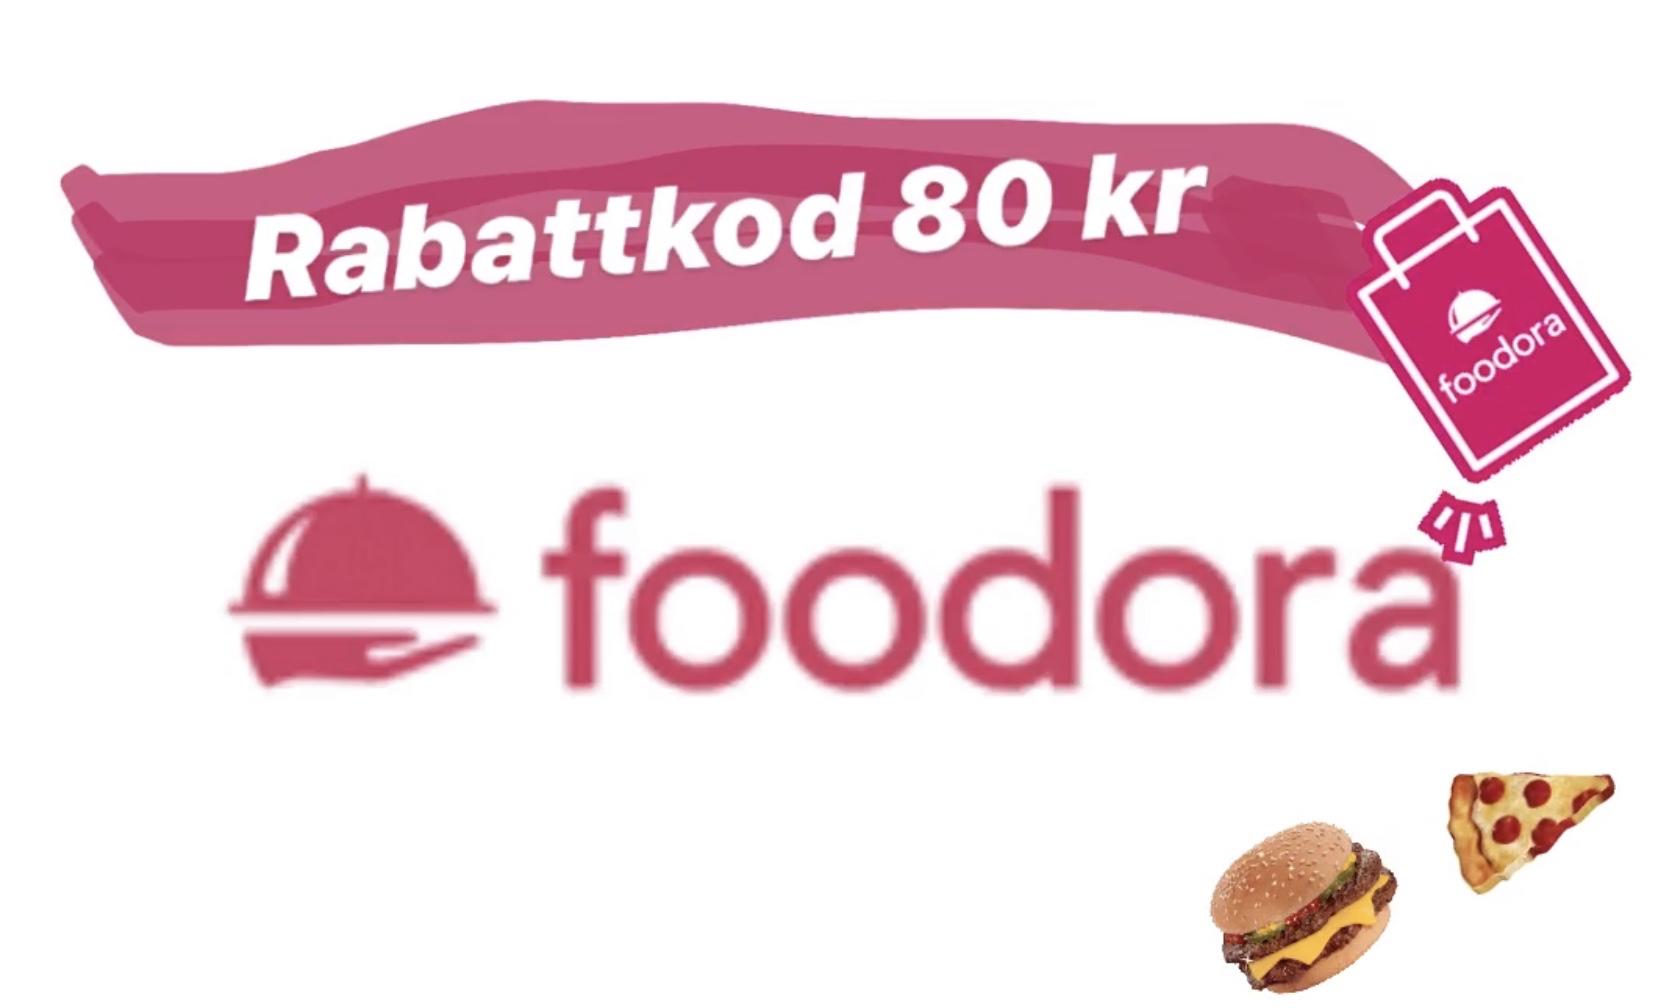 rabattkod foodora